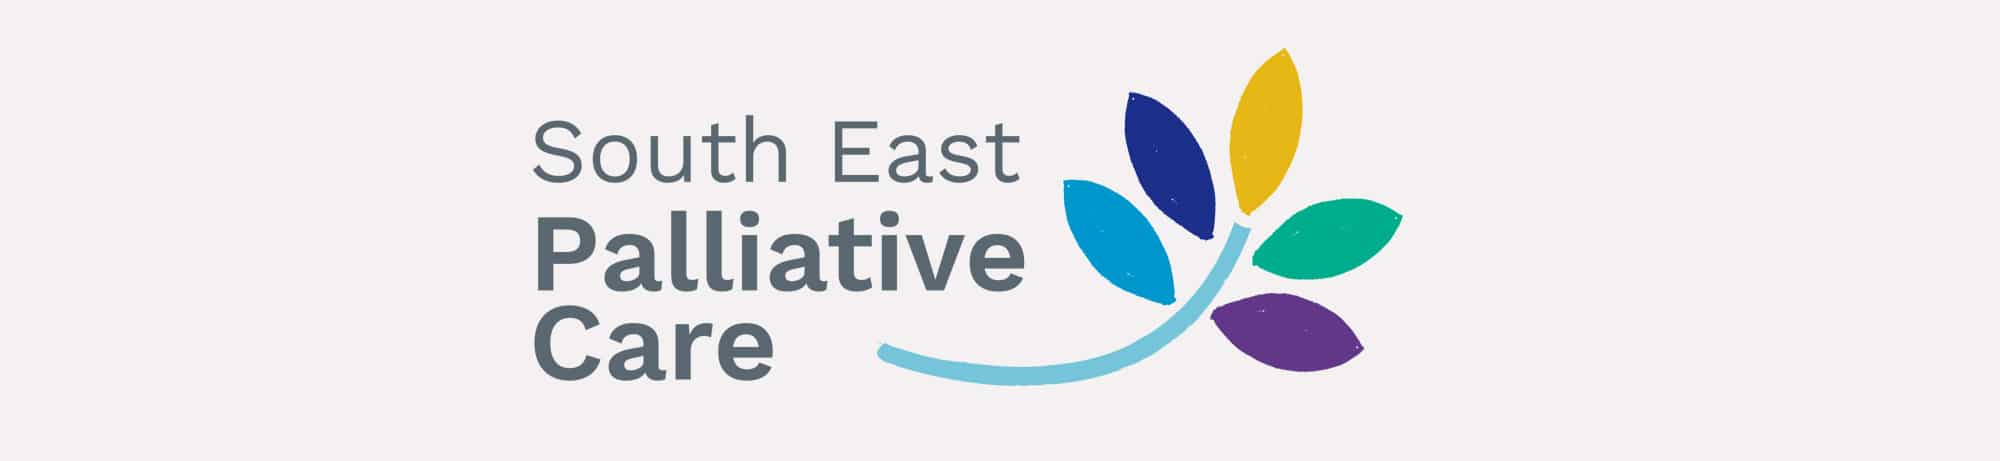 South East Palliative Care